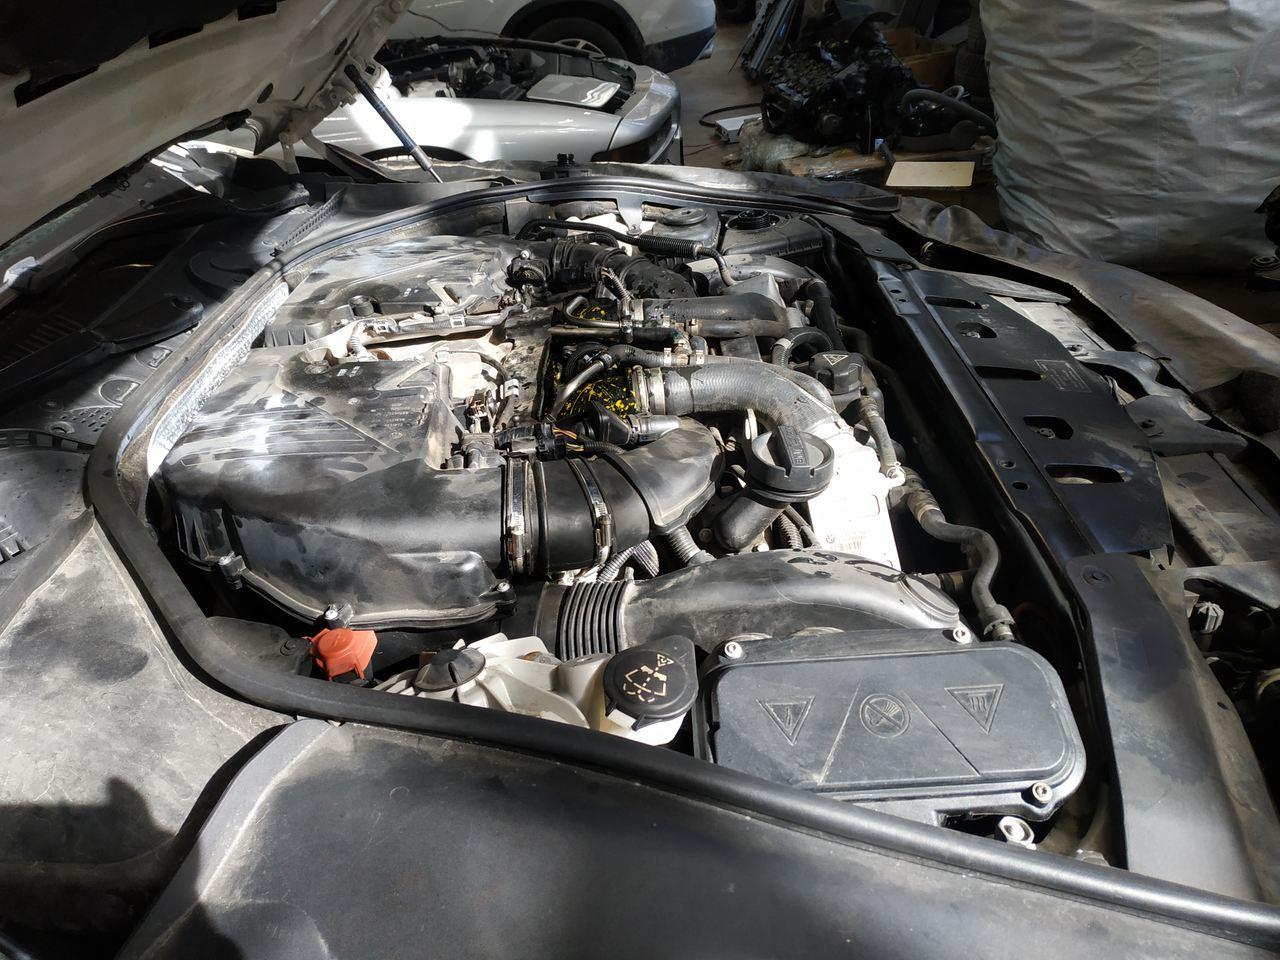 двигатель N63B44 с новыми турбинами